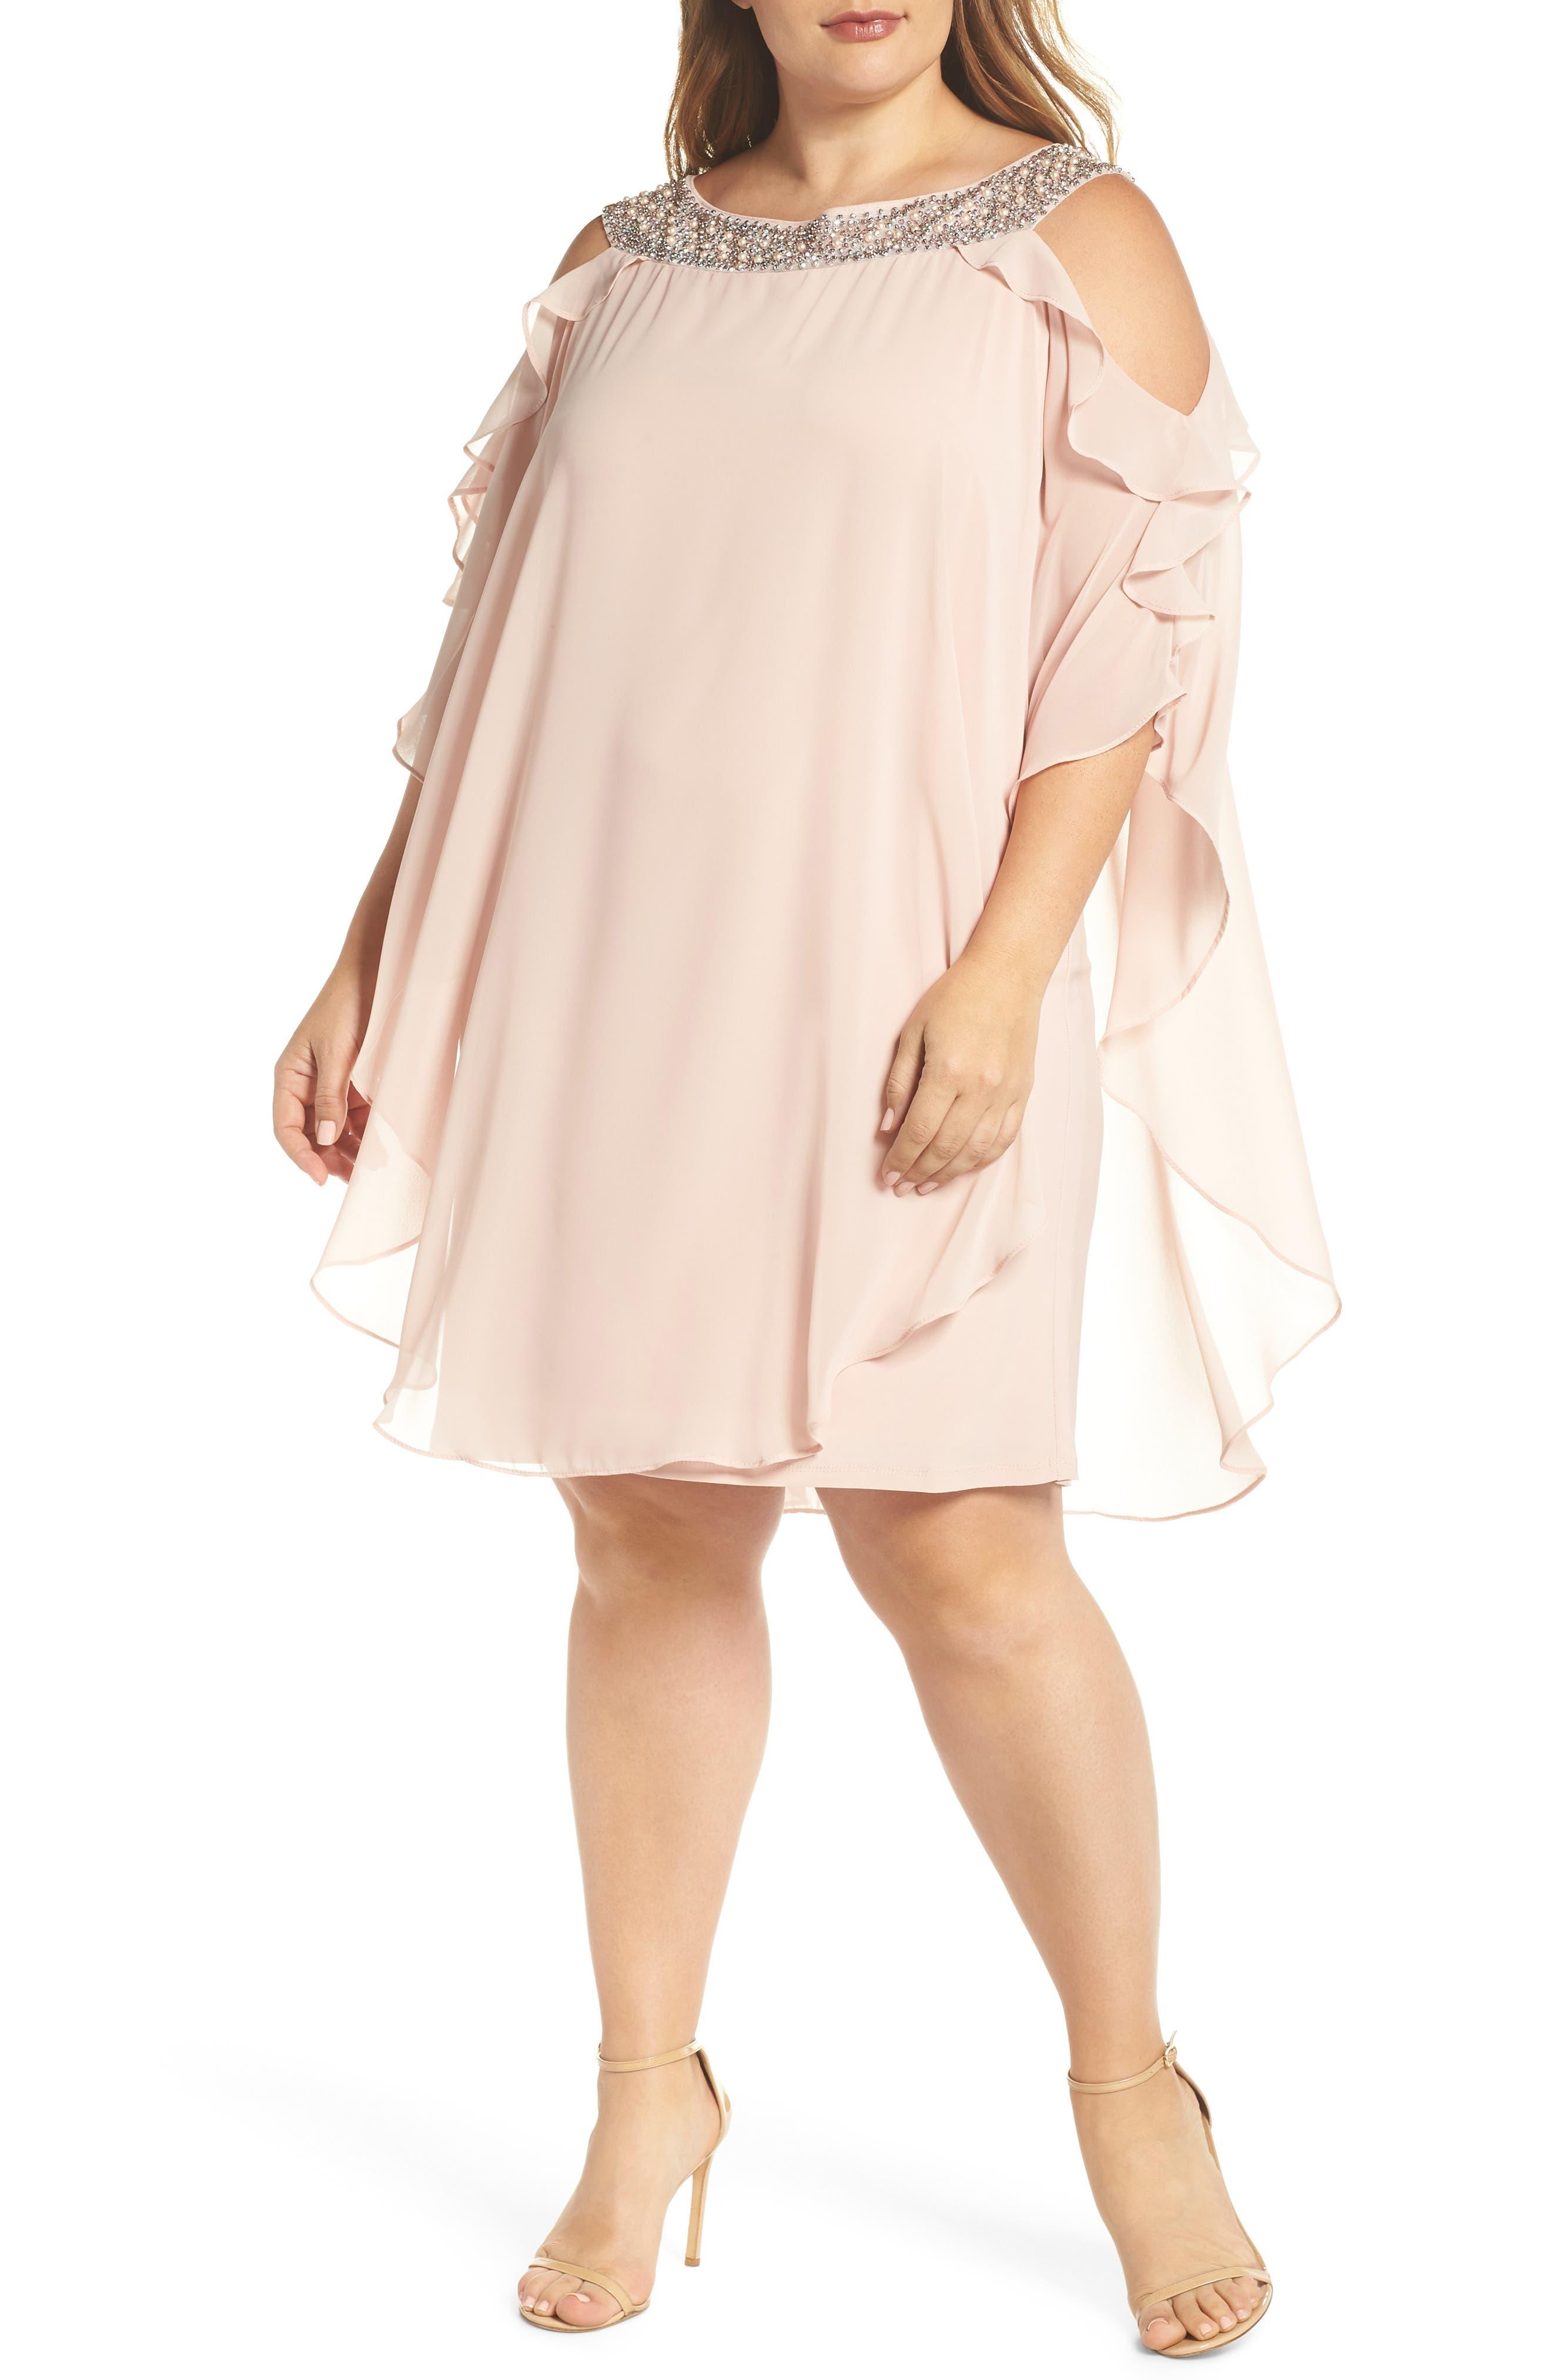 Embellished Neck Cold Shoulder Overlay Chiffon Shift Dress,                             Main thumbnail 1, color,                             BLUSH